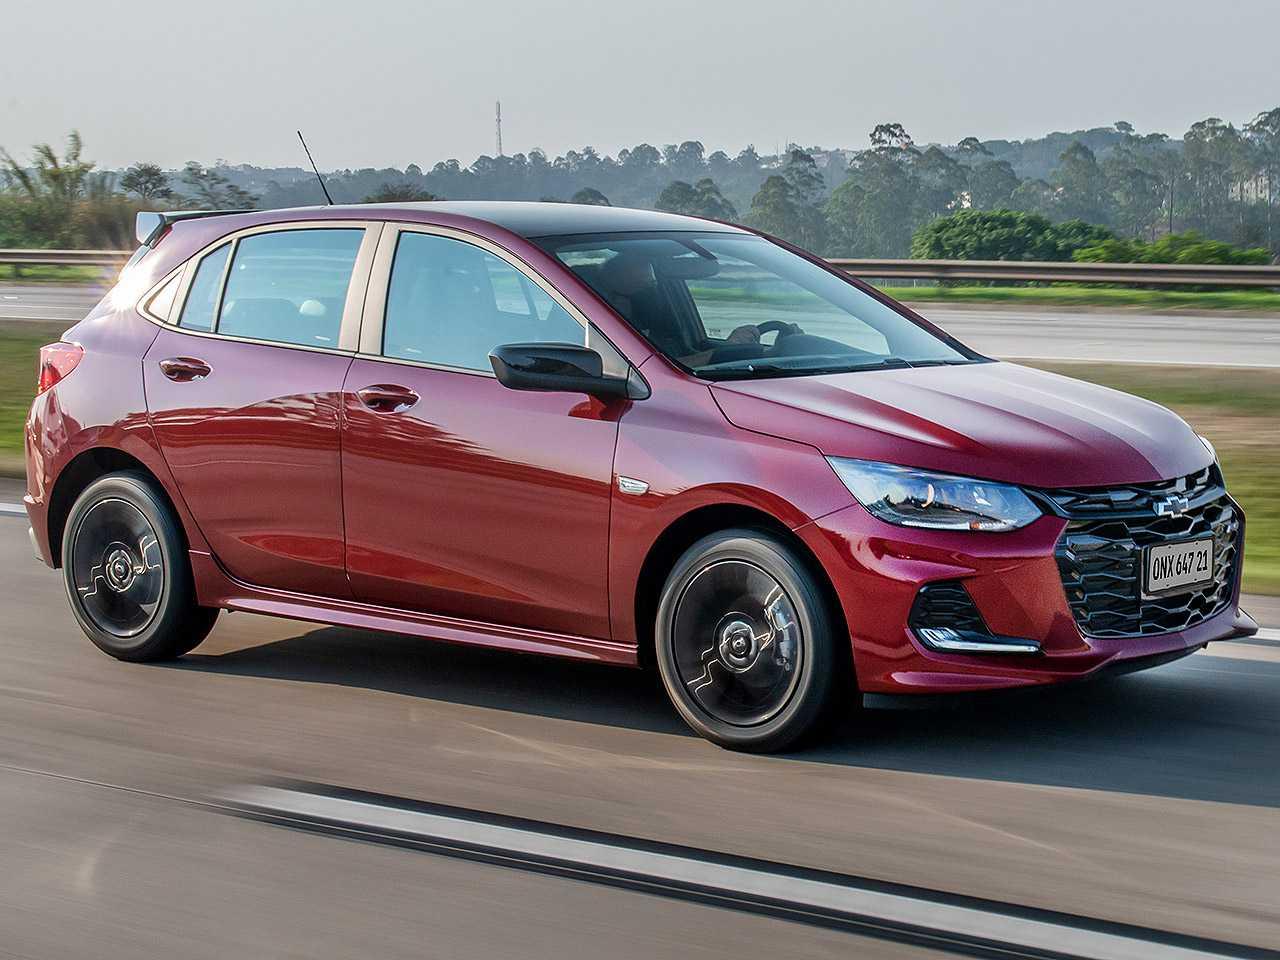 ChevroletOnix 2021 - ângulo frontal